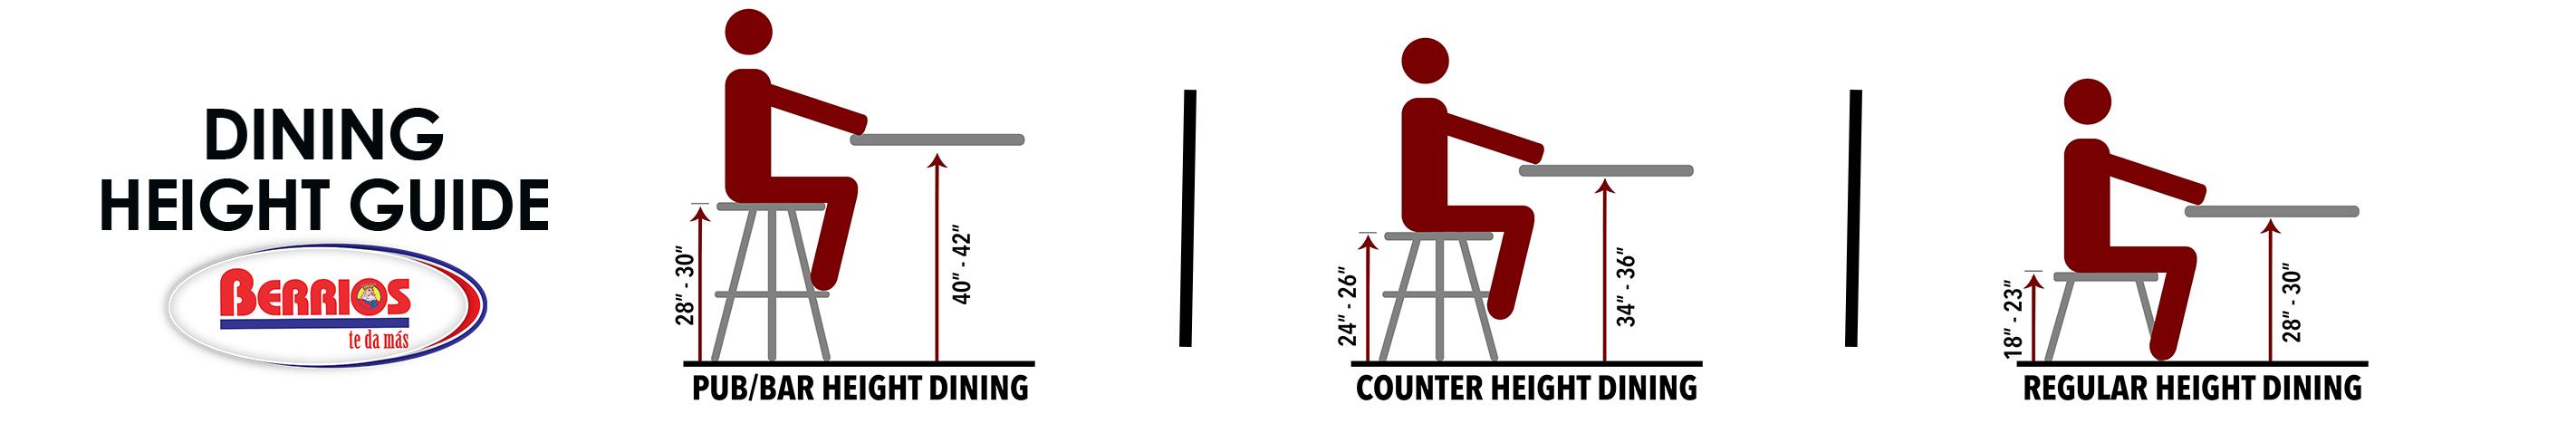 banner-dining-height-guide.jpg